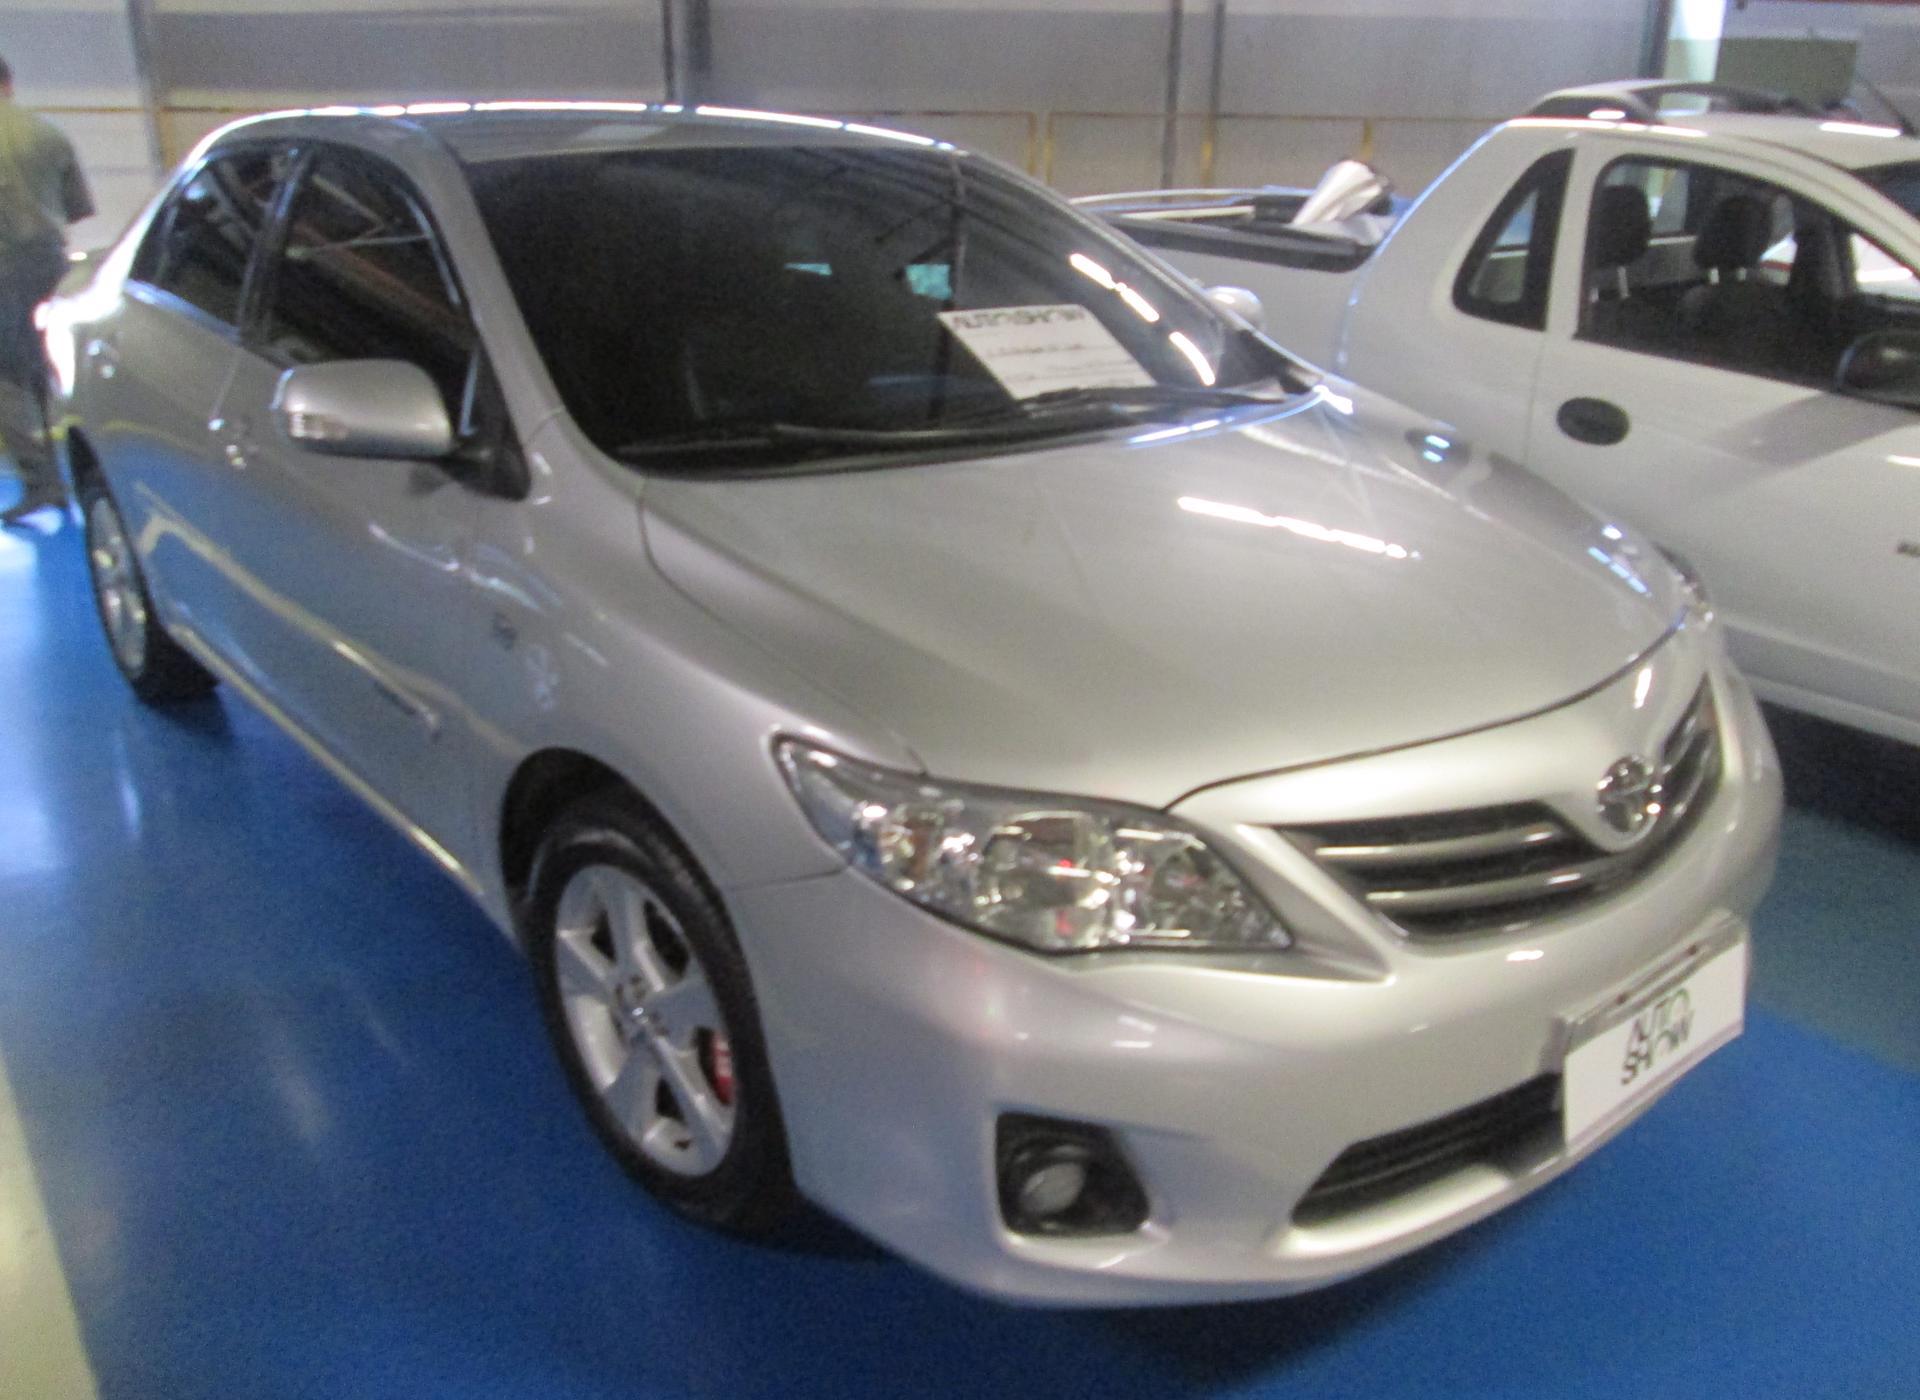 Feirão Auto Show Shopping ABC - TOYOTA COROLLA XEI 2.0 FLEX 16V AUT. 2012-2012